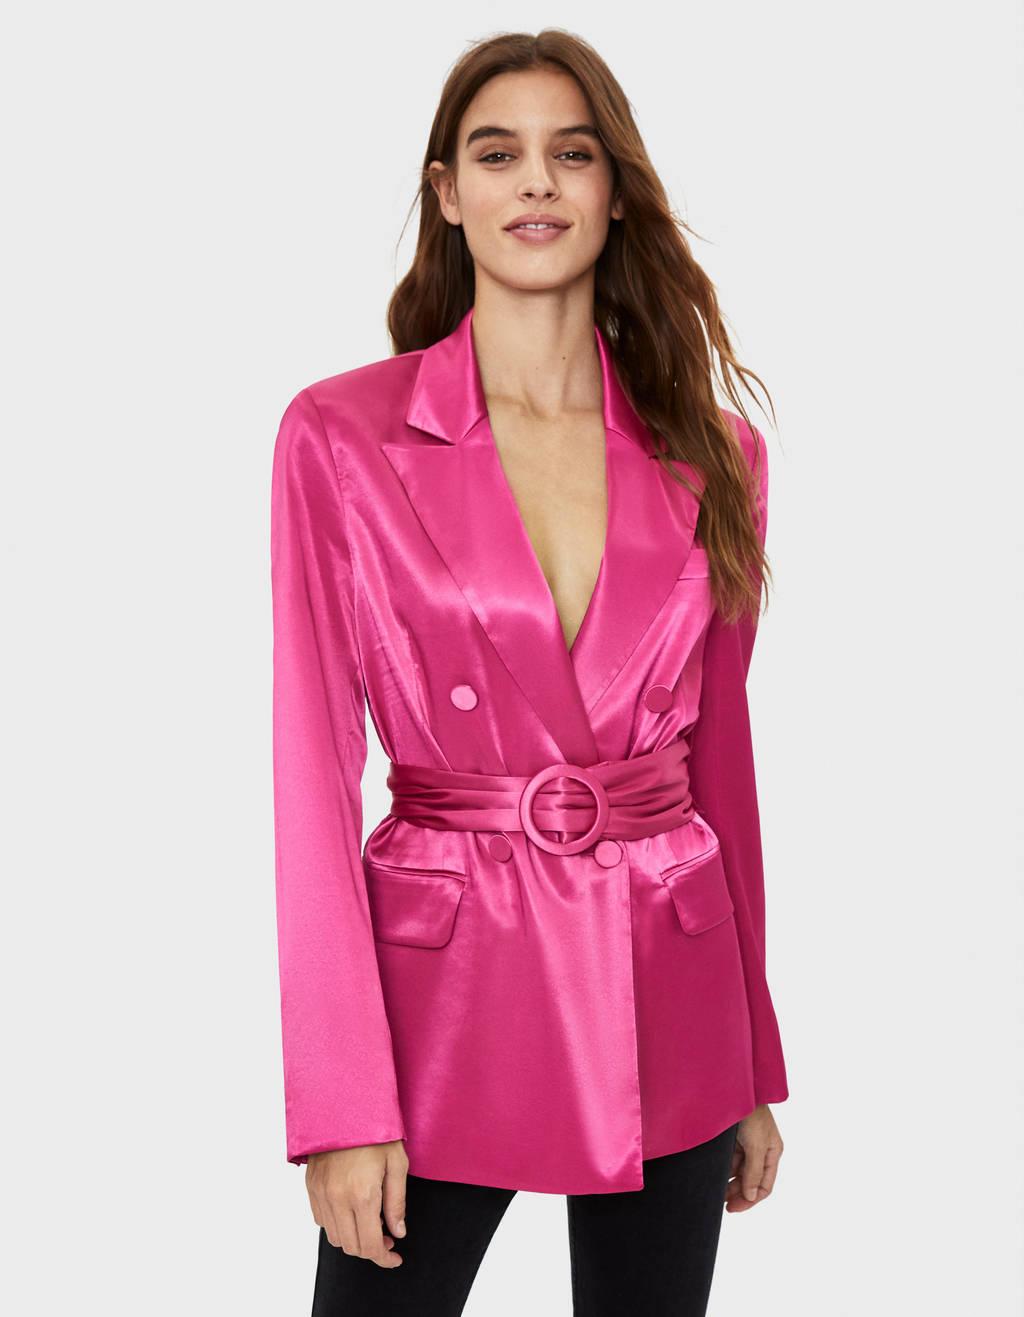 Veste tailleur satinée avec ceinture